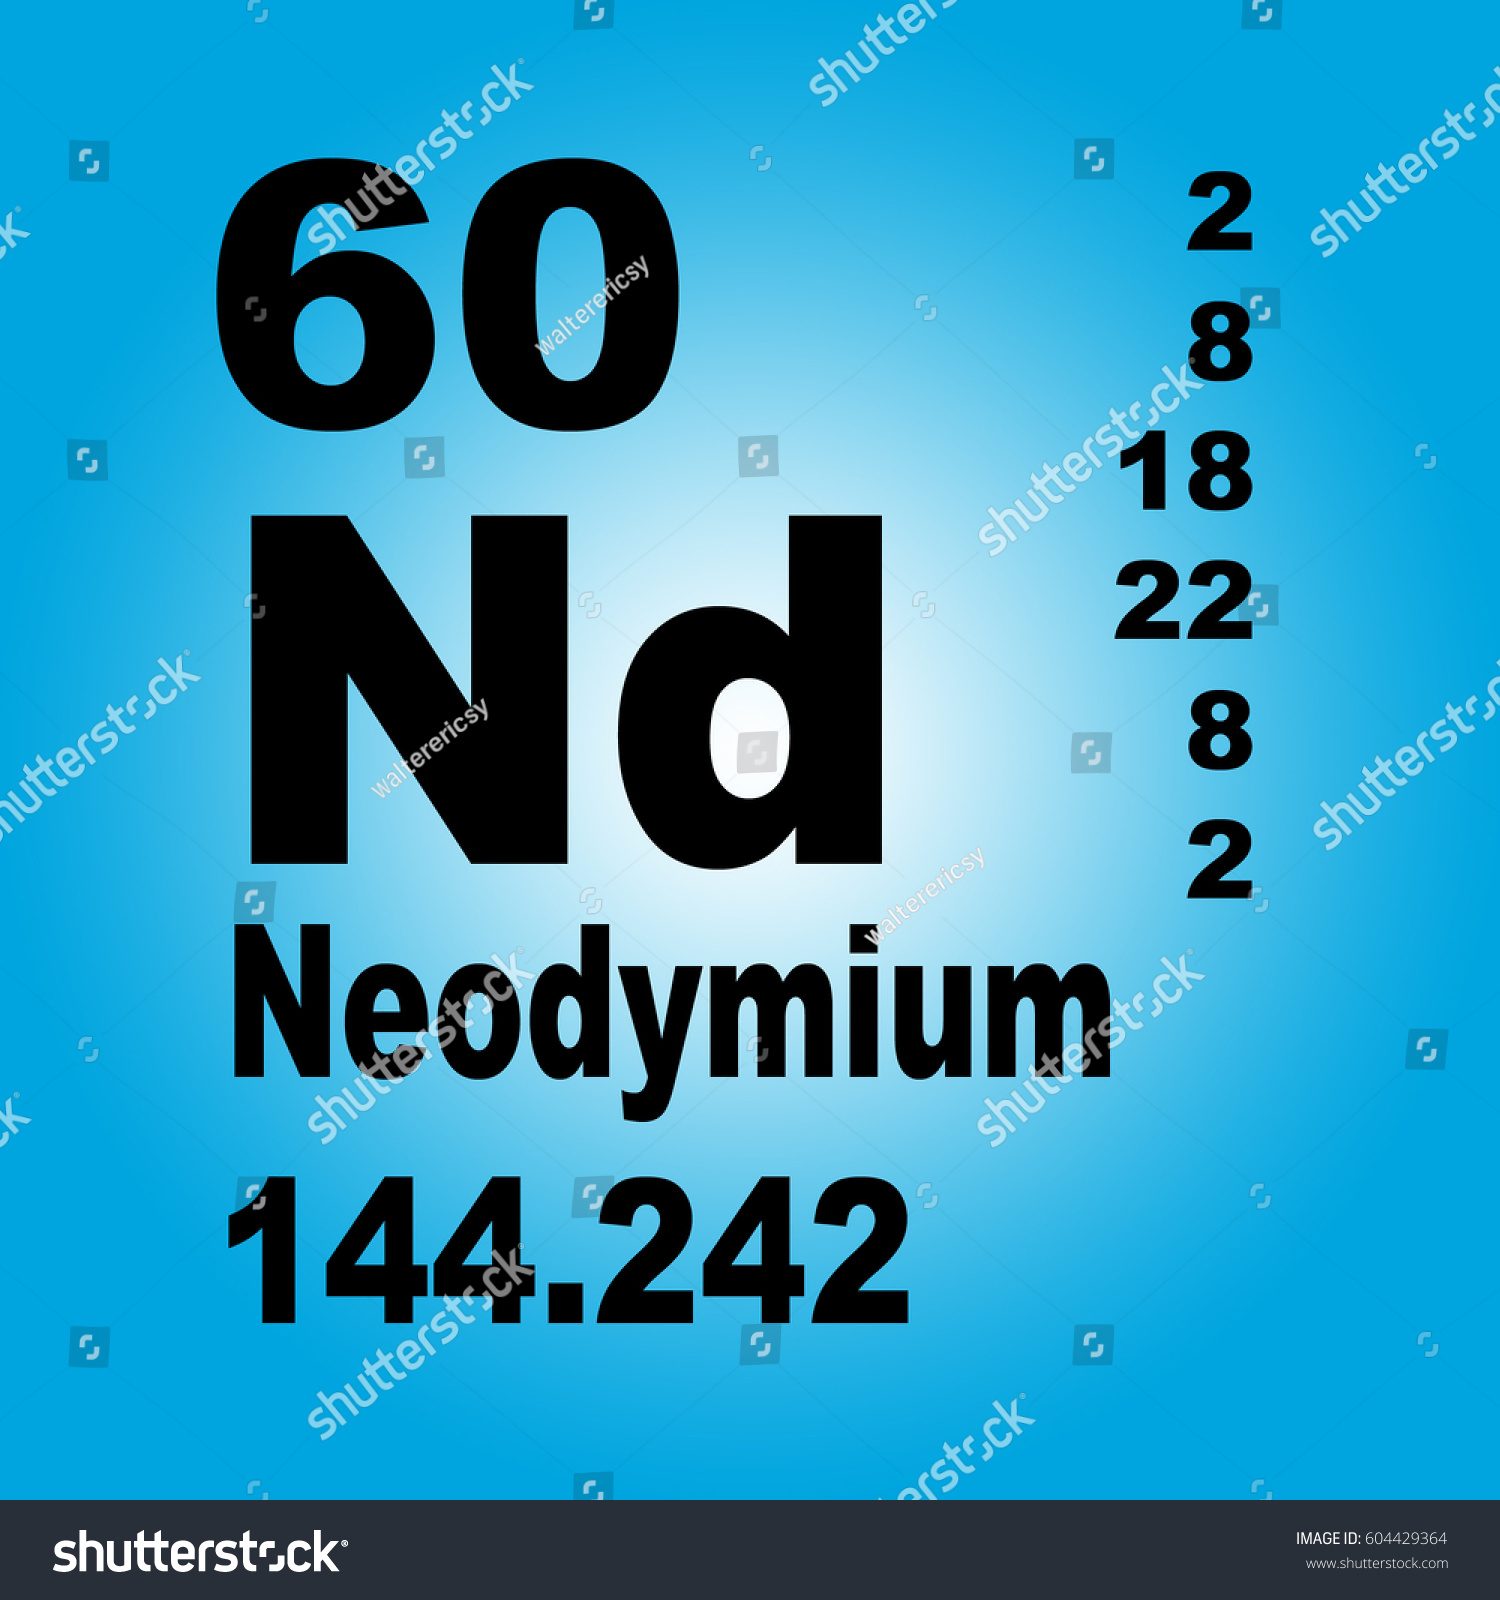 Neodymium periodic table elements stock illustration 604429364 neodymium periodic table of elements gamestrikefo Choice Image